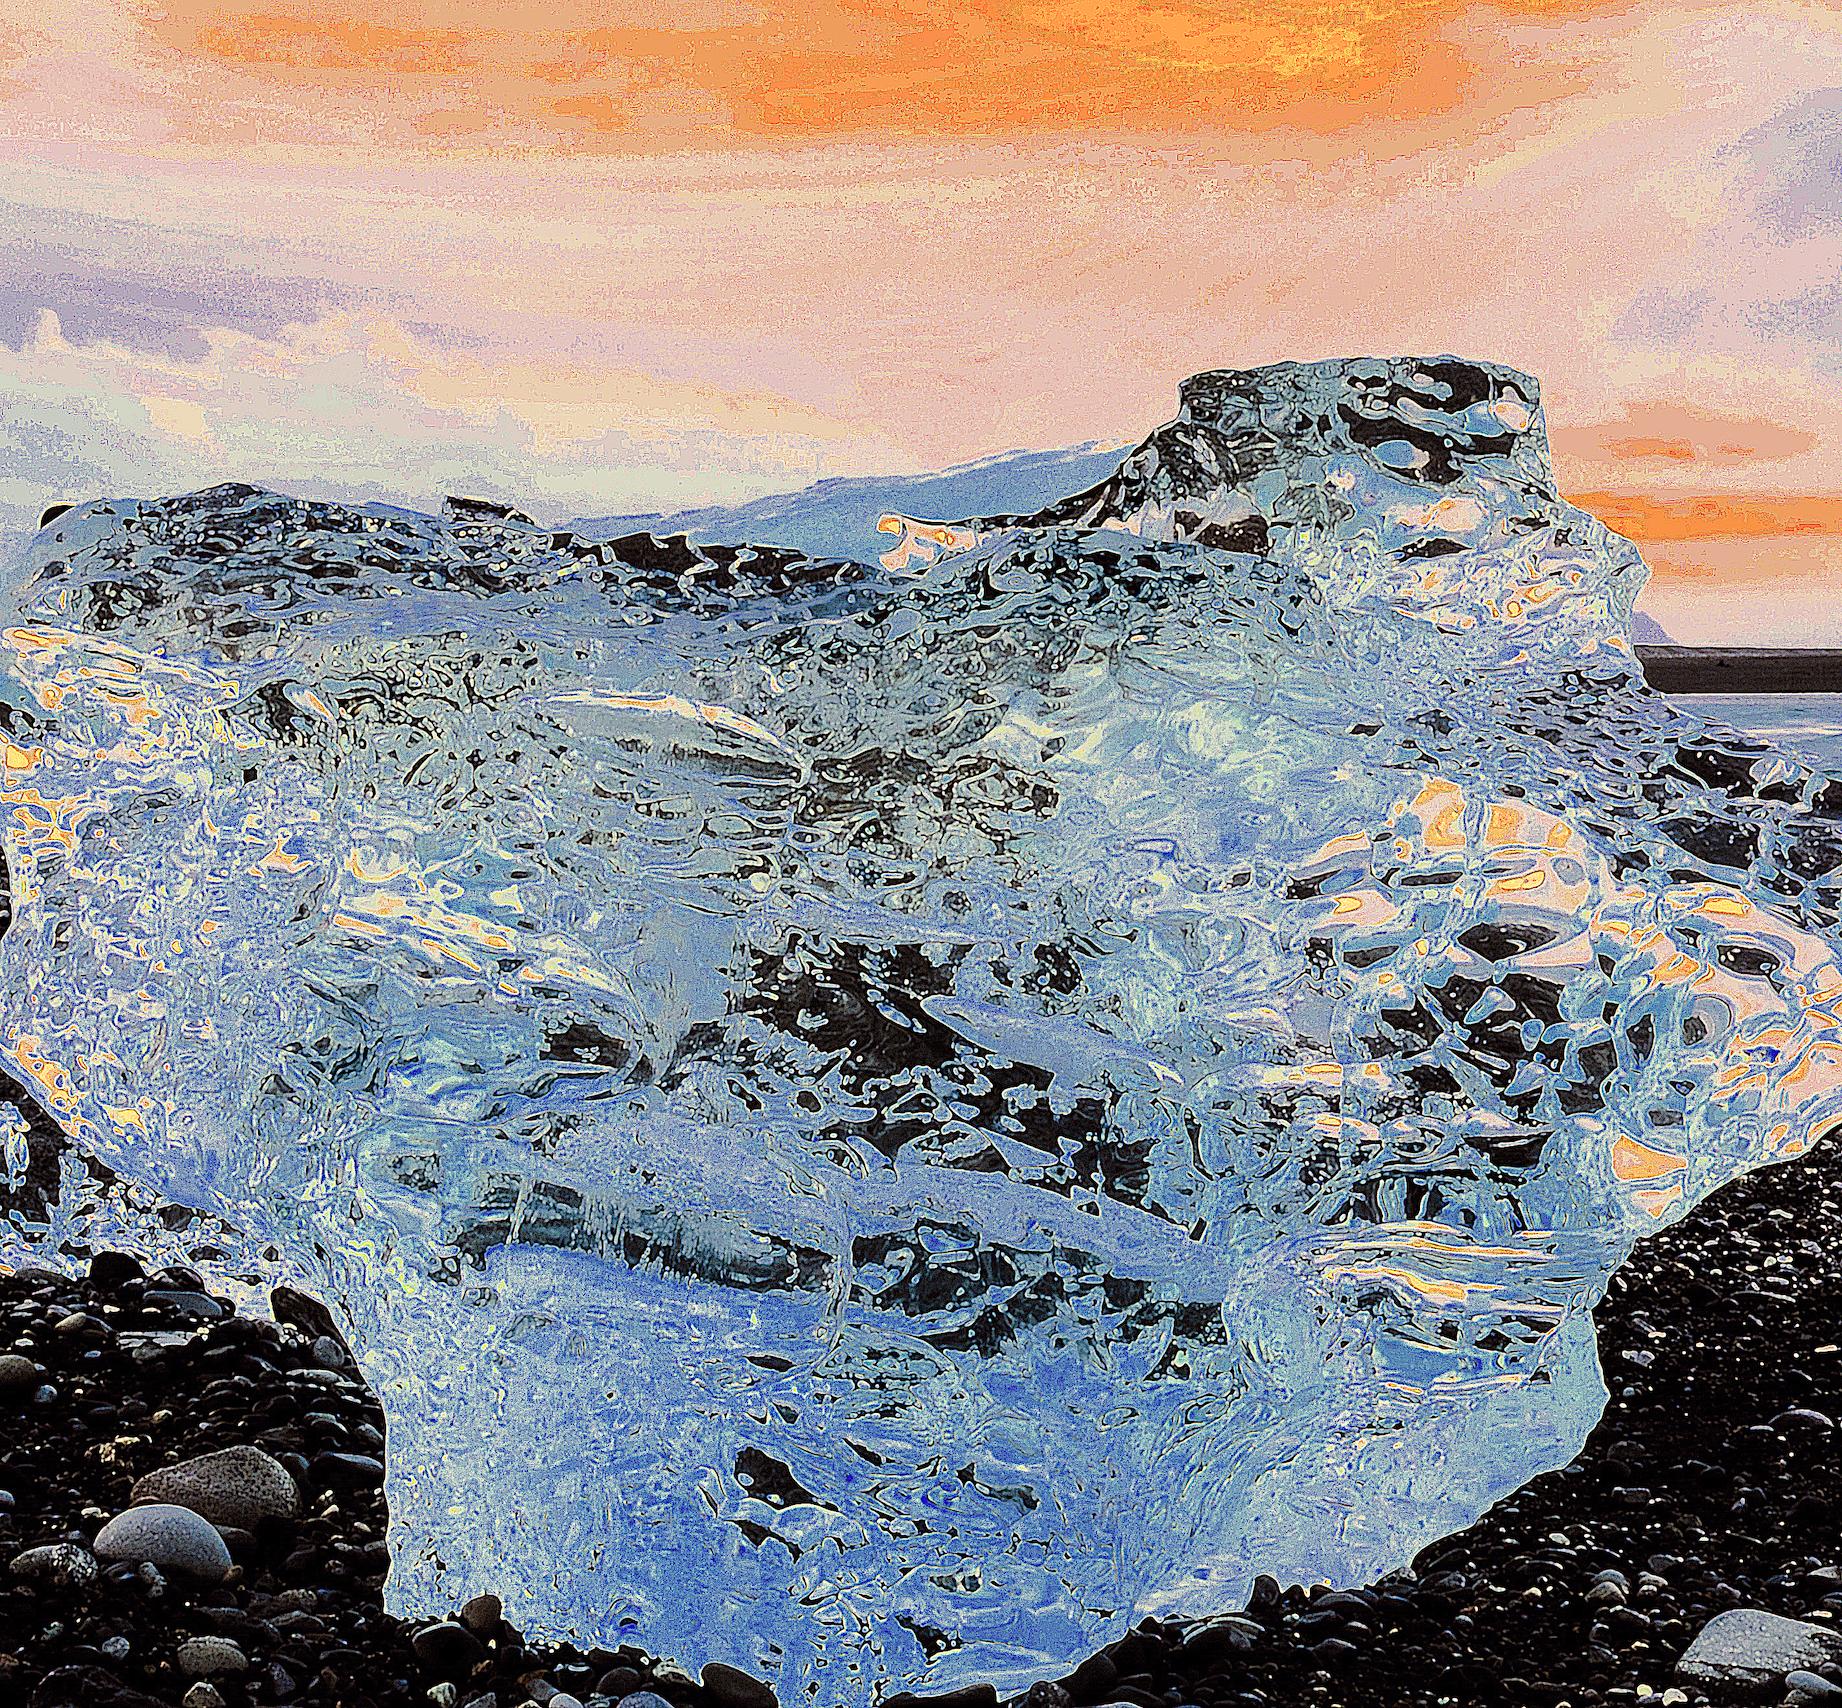 Beneath the Cryosphere / Part III,  2019 Aquarelle, wax pastels, UV-print on mirror beneath structured Plexiglas 120 x 120 cm (47 x 47 in)